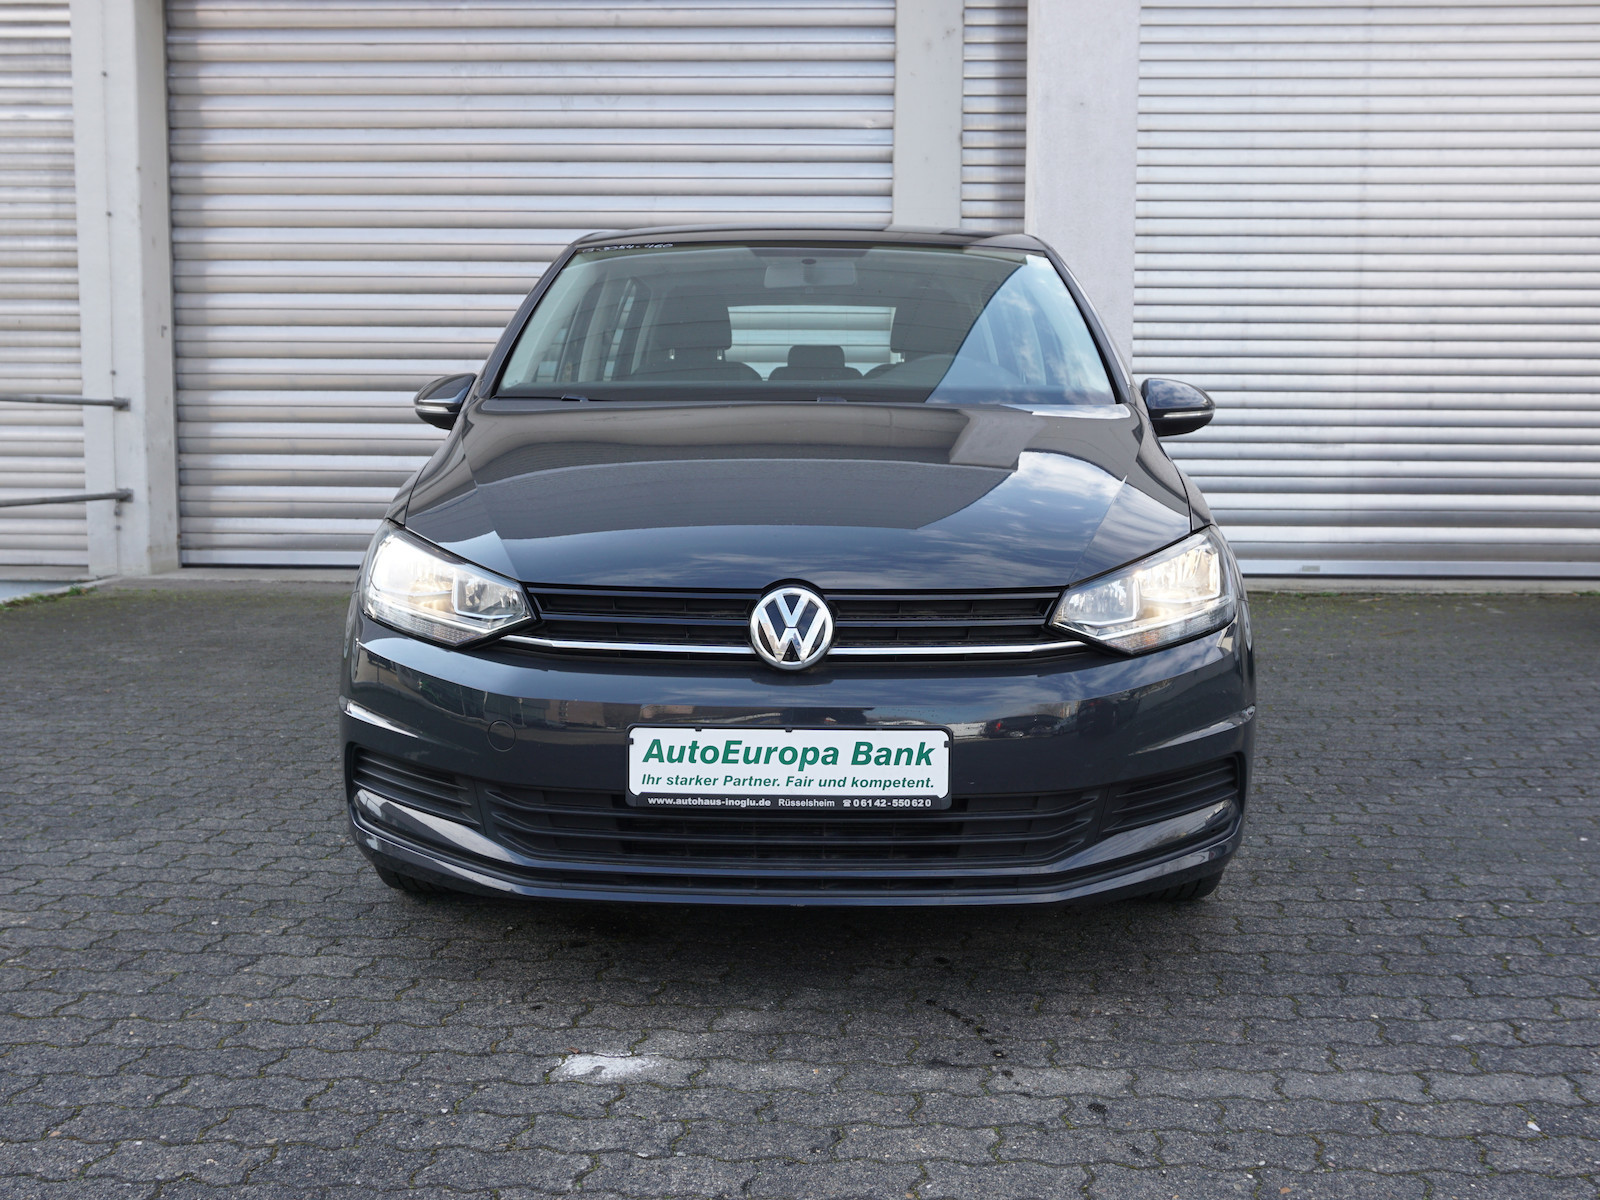 VW_Touran__11